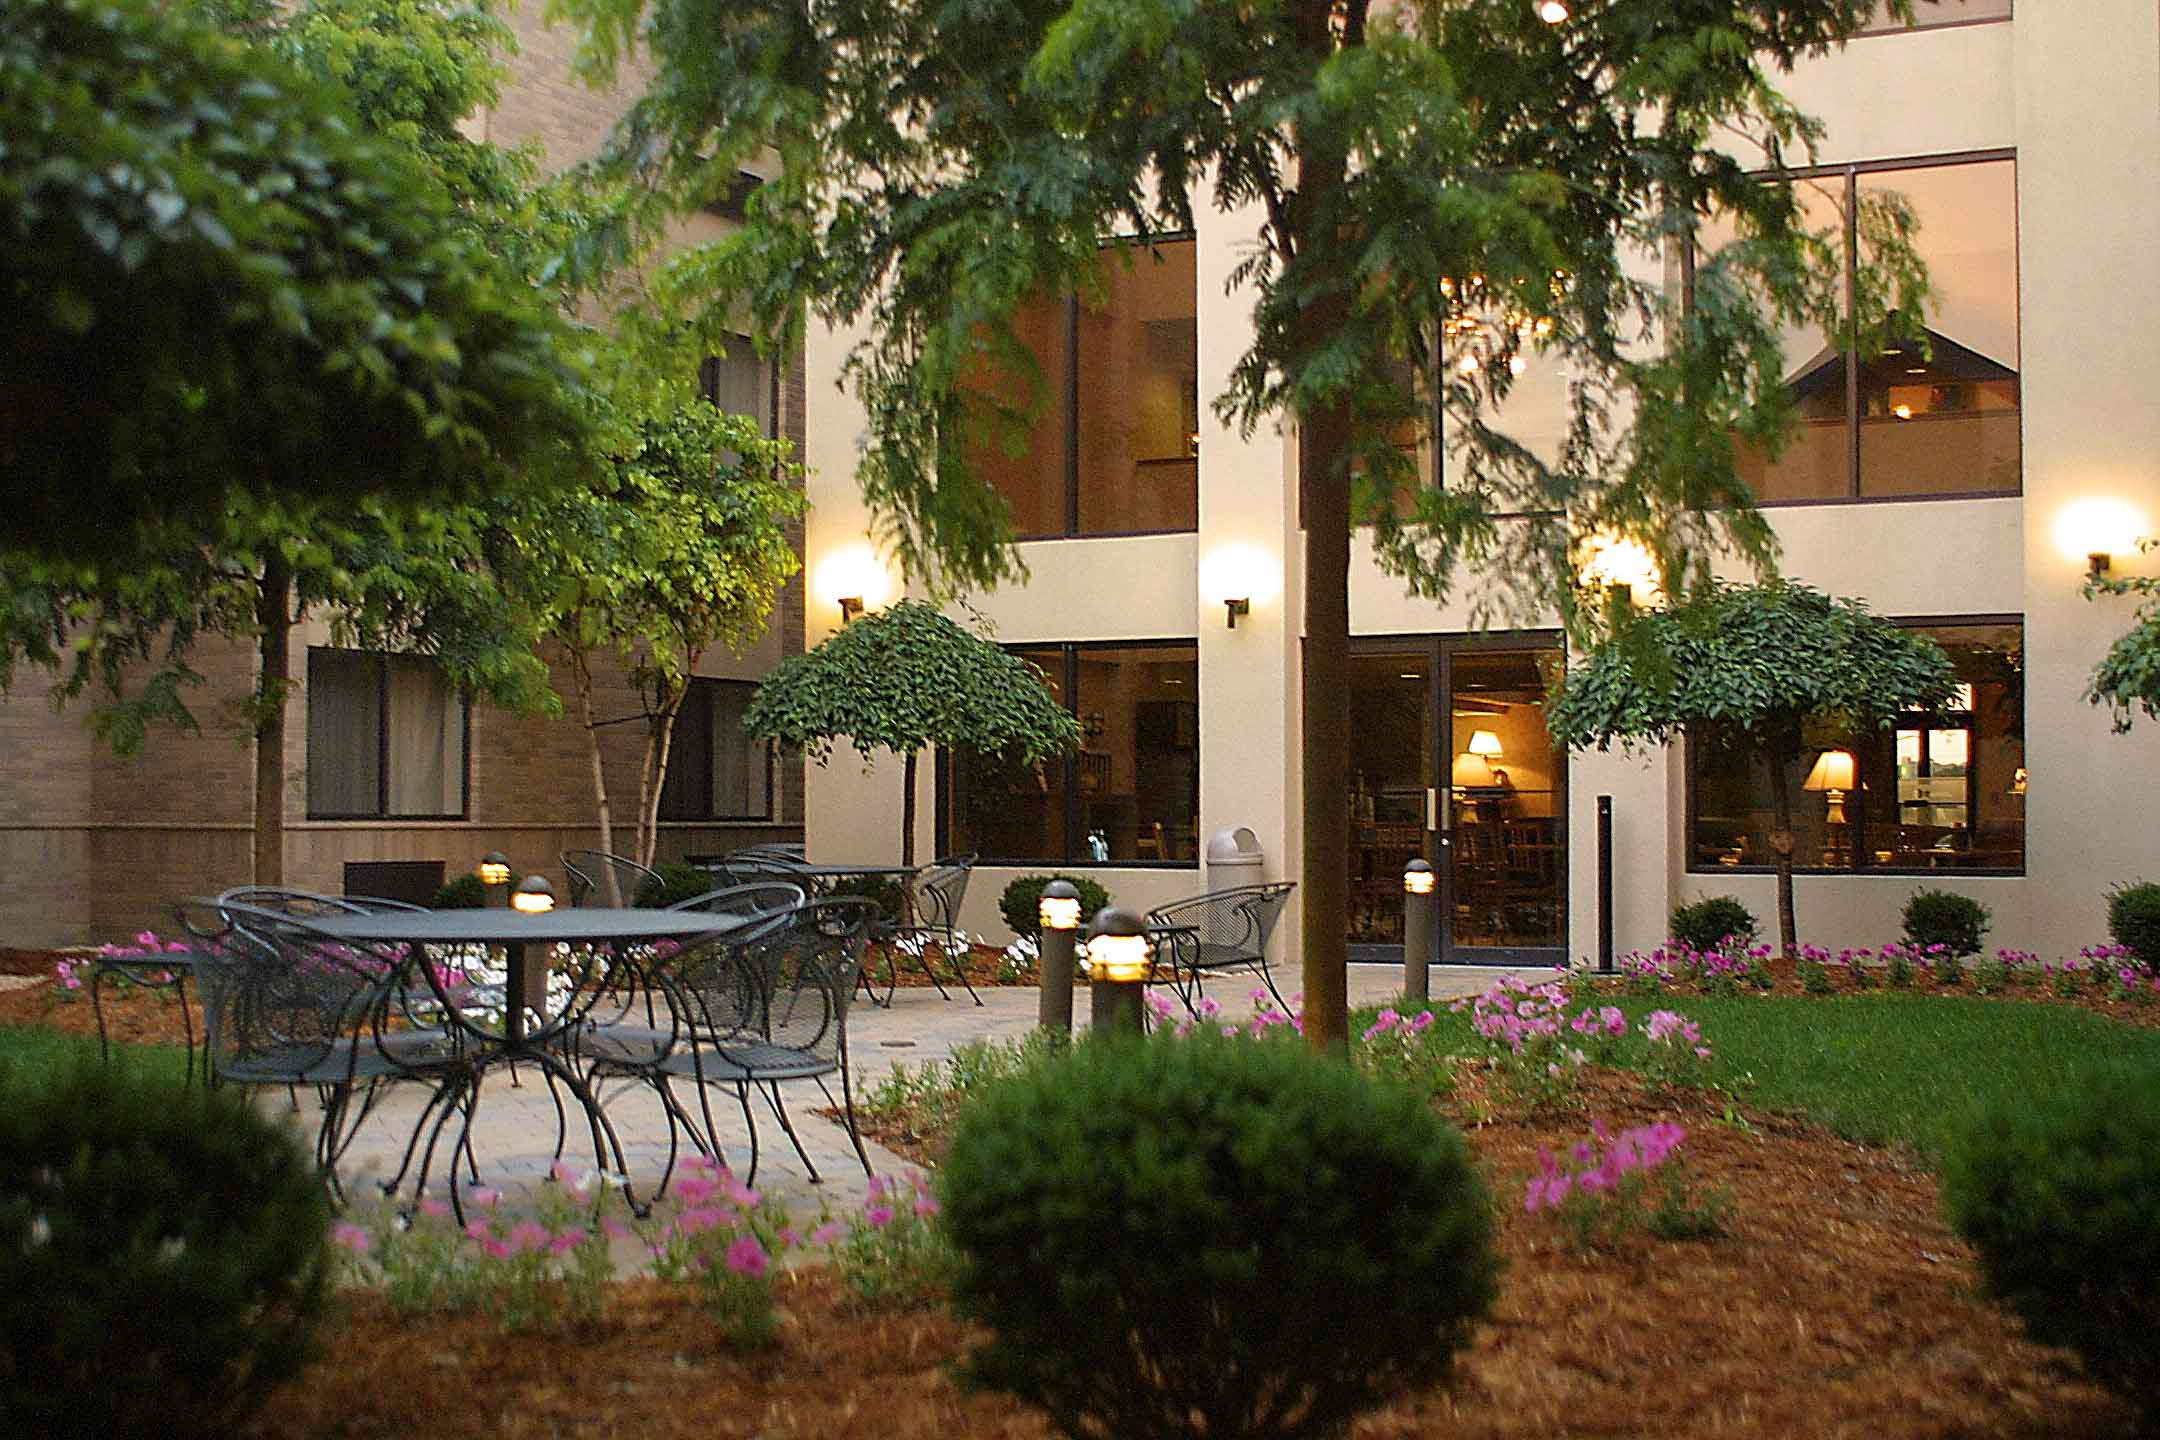 Hampton Inn & Suites Chillicothe